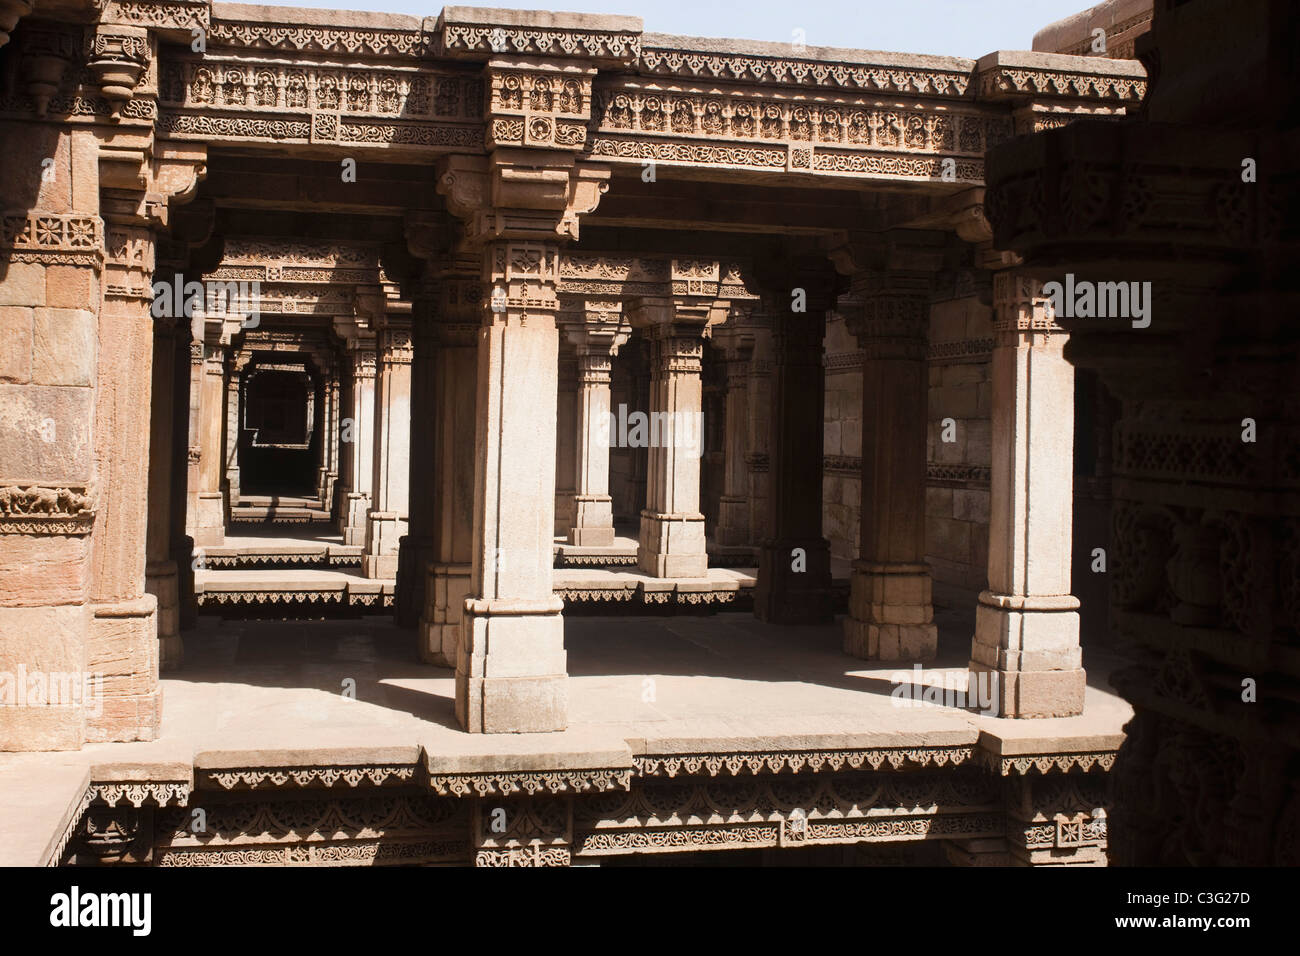 Architectural details of a building, Adalaj Vav, Ahmedabad, Gujarat, India - Stock Image